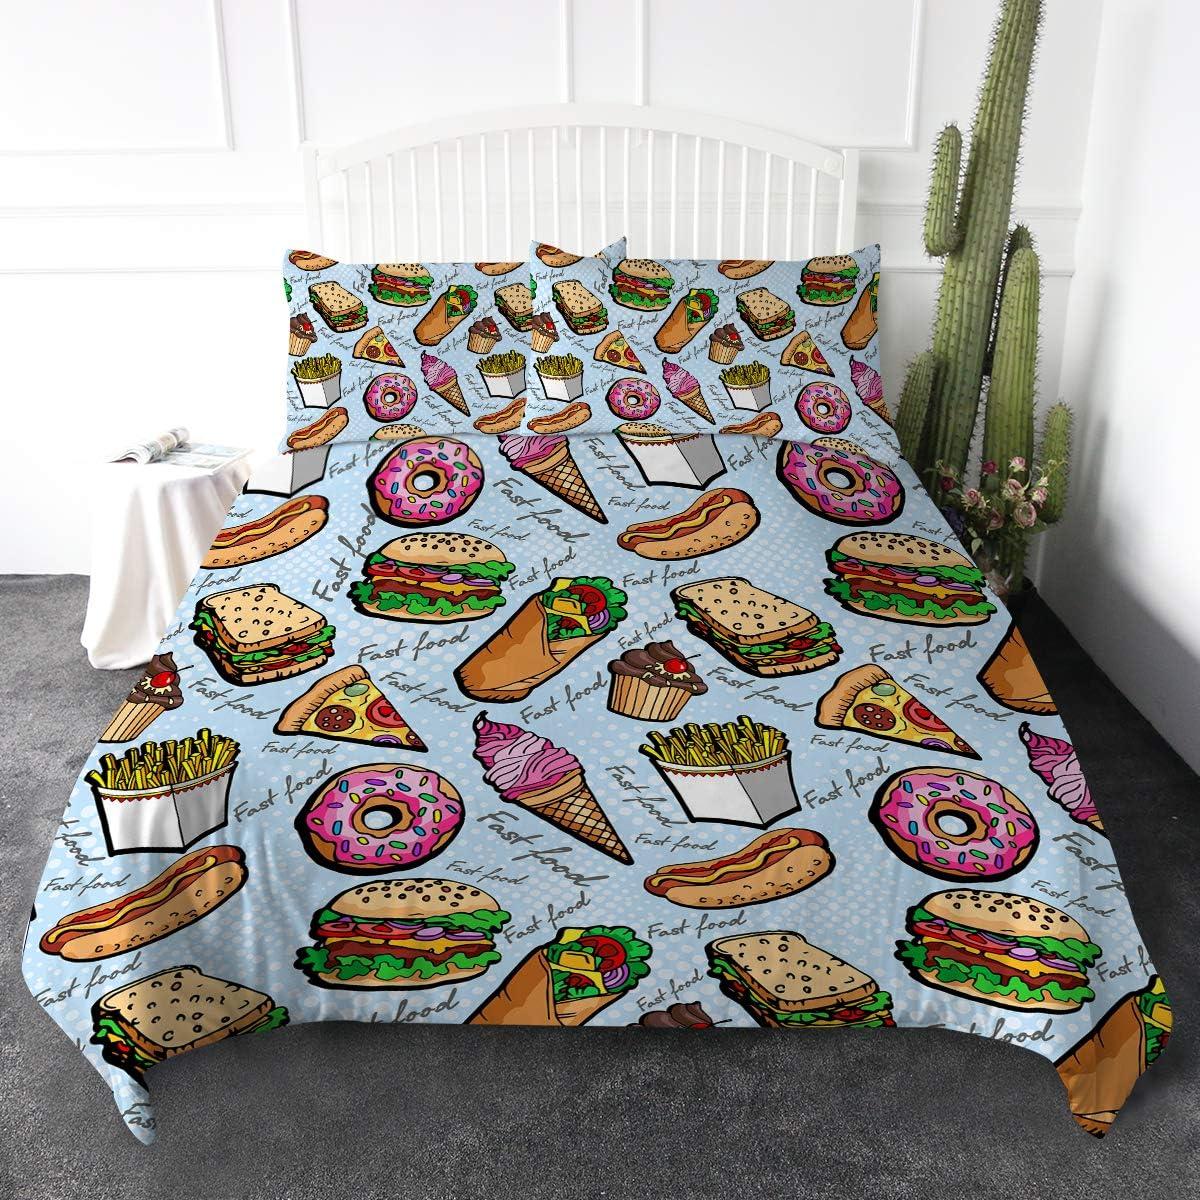 ARIGHTEX Fast Food Duvet Cover Set Pop Art Bedding Sets Hamburger Hot Dog Pizza Sandwich 3D Print Comforter Cover 3 Pieces Funny Creative Bedspread (Full)